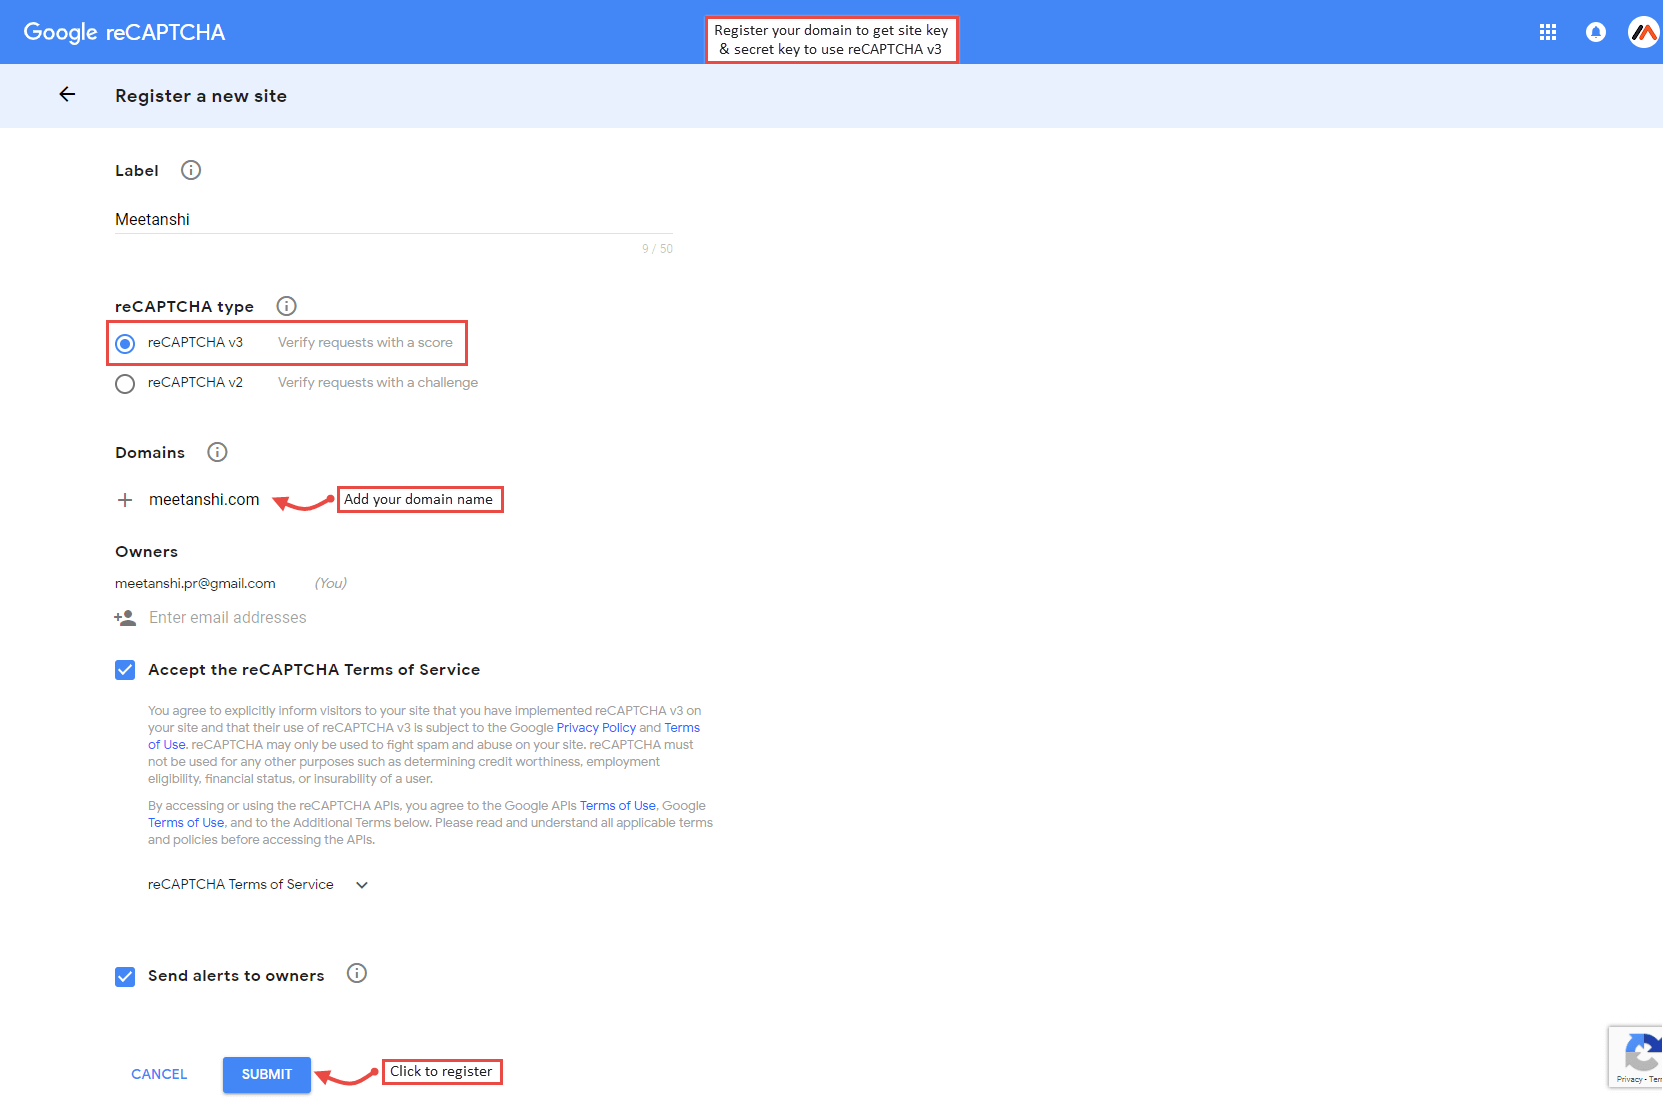 Google reCAPTCHA v3 Settings